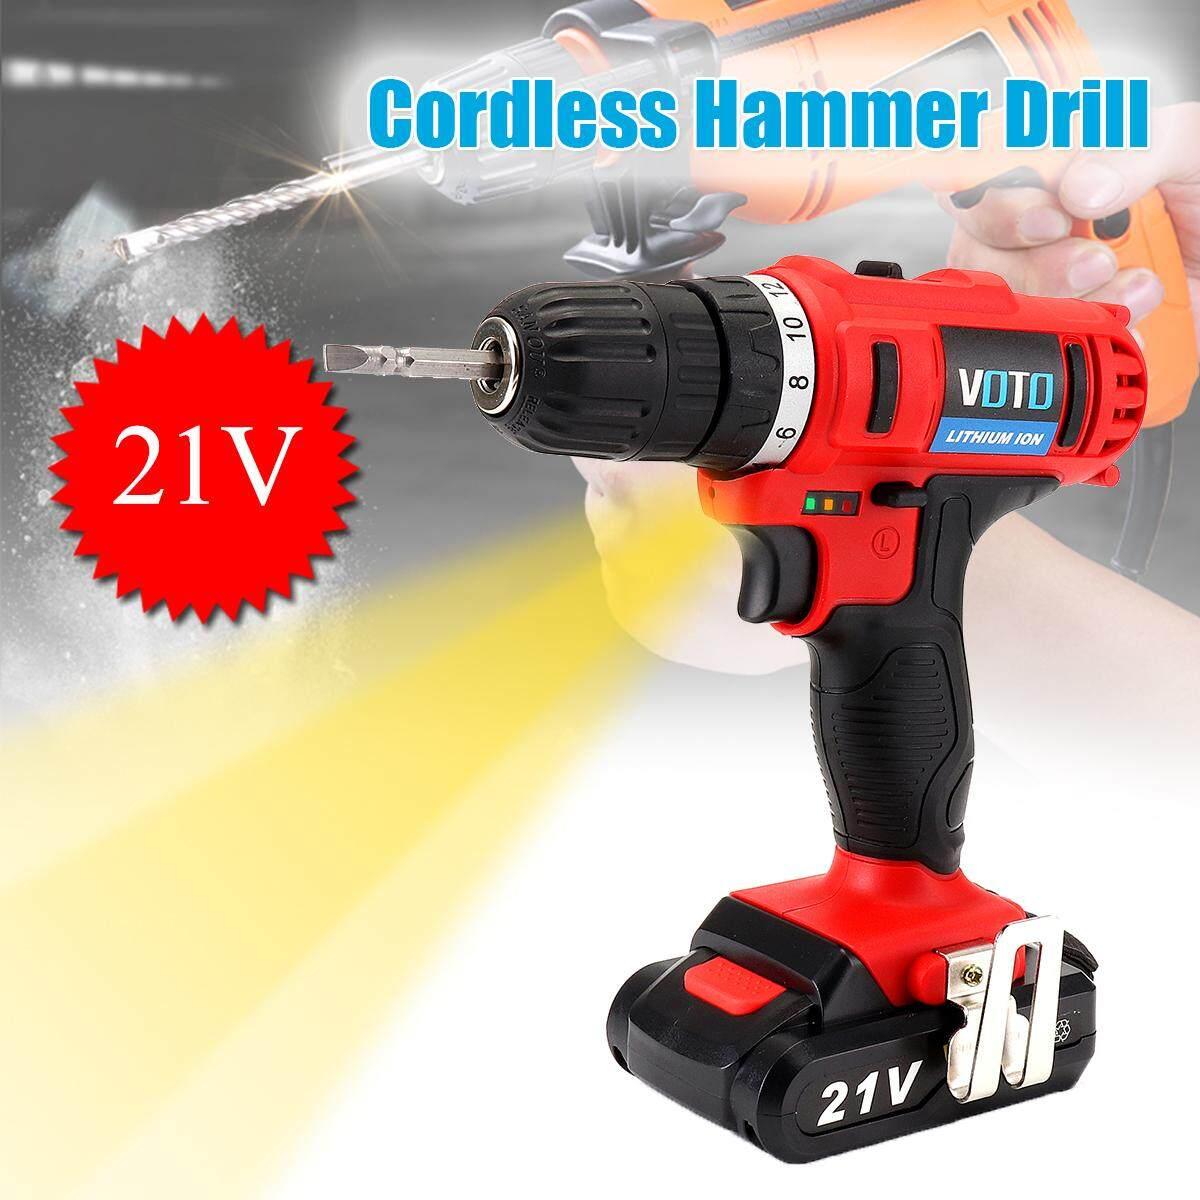 21V 2.0Ah Cordless Hammer Drill Li-ion Battery Two Speed LED Light 36N.